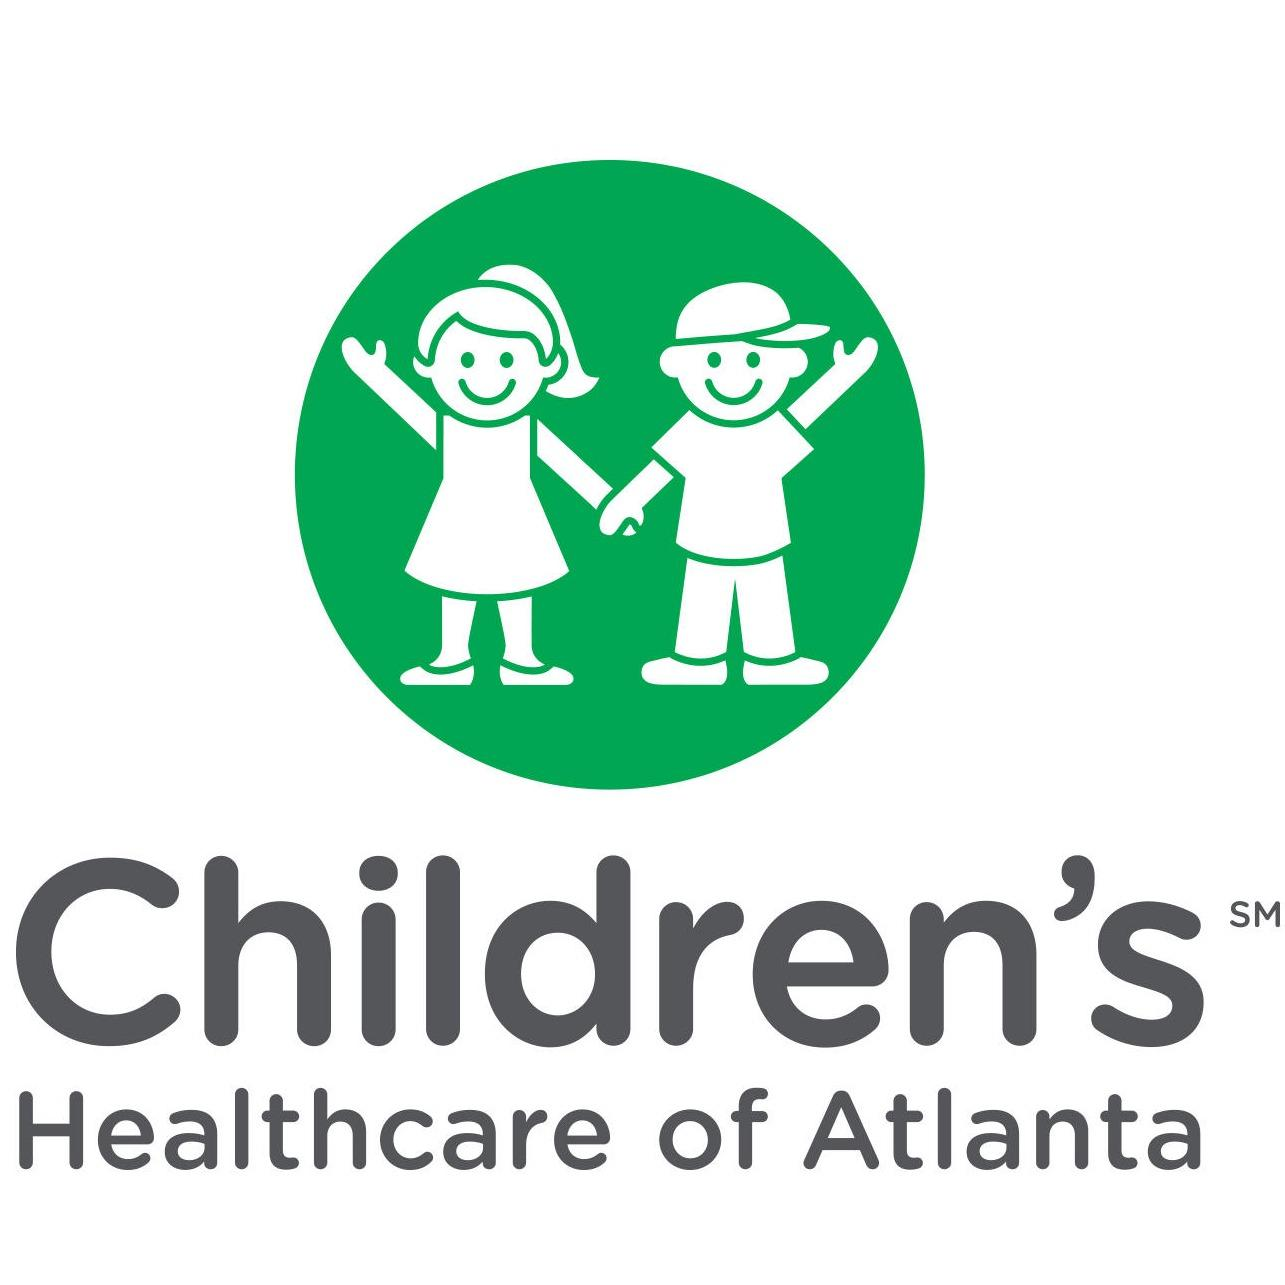 Children's Healthcare of Atlanta - Egleston Hospital